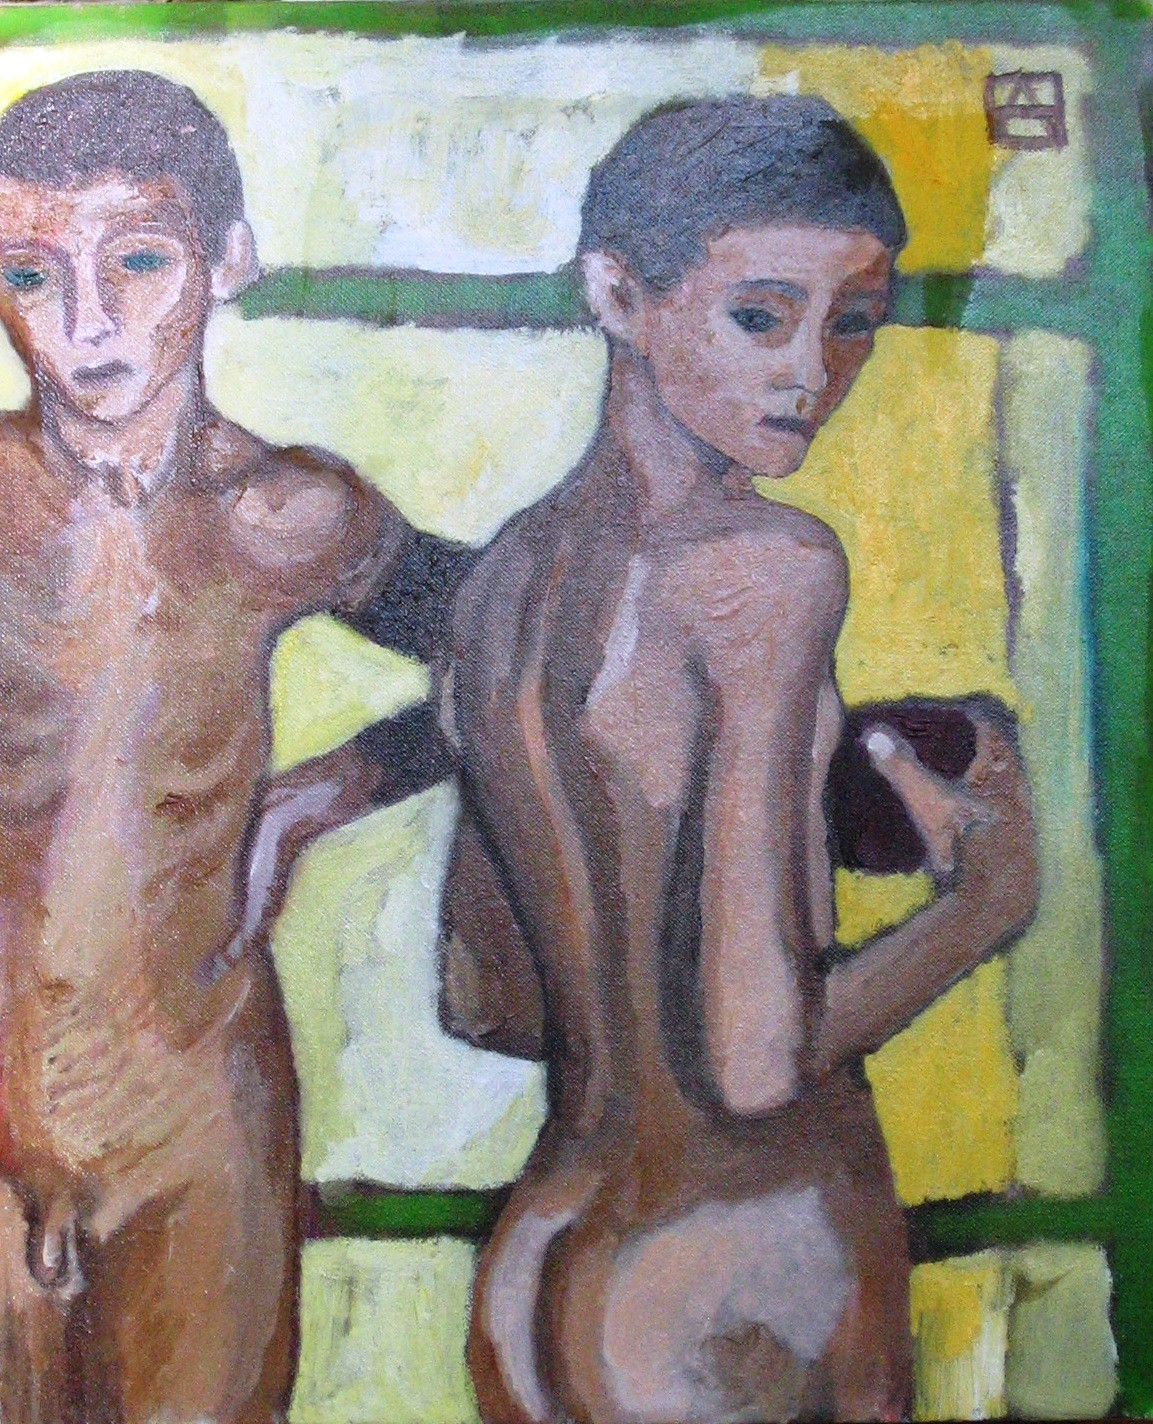 Galerie nu des garçons